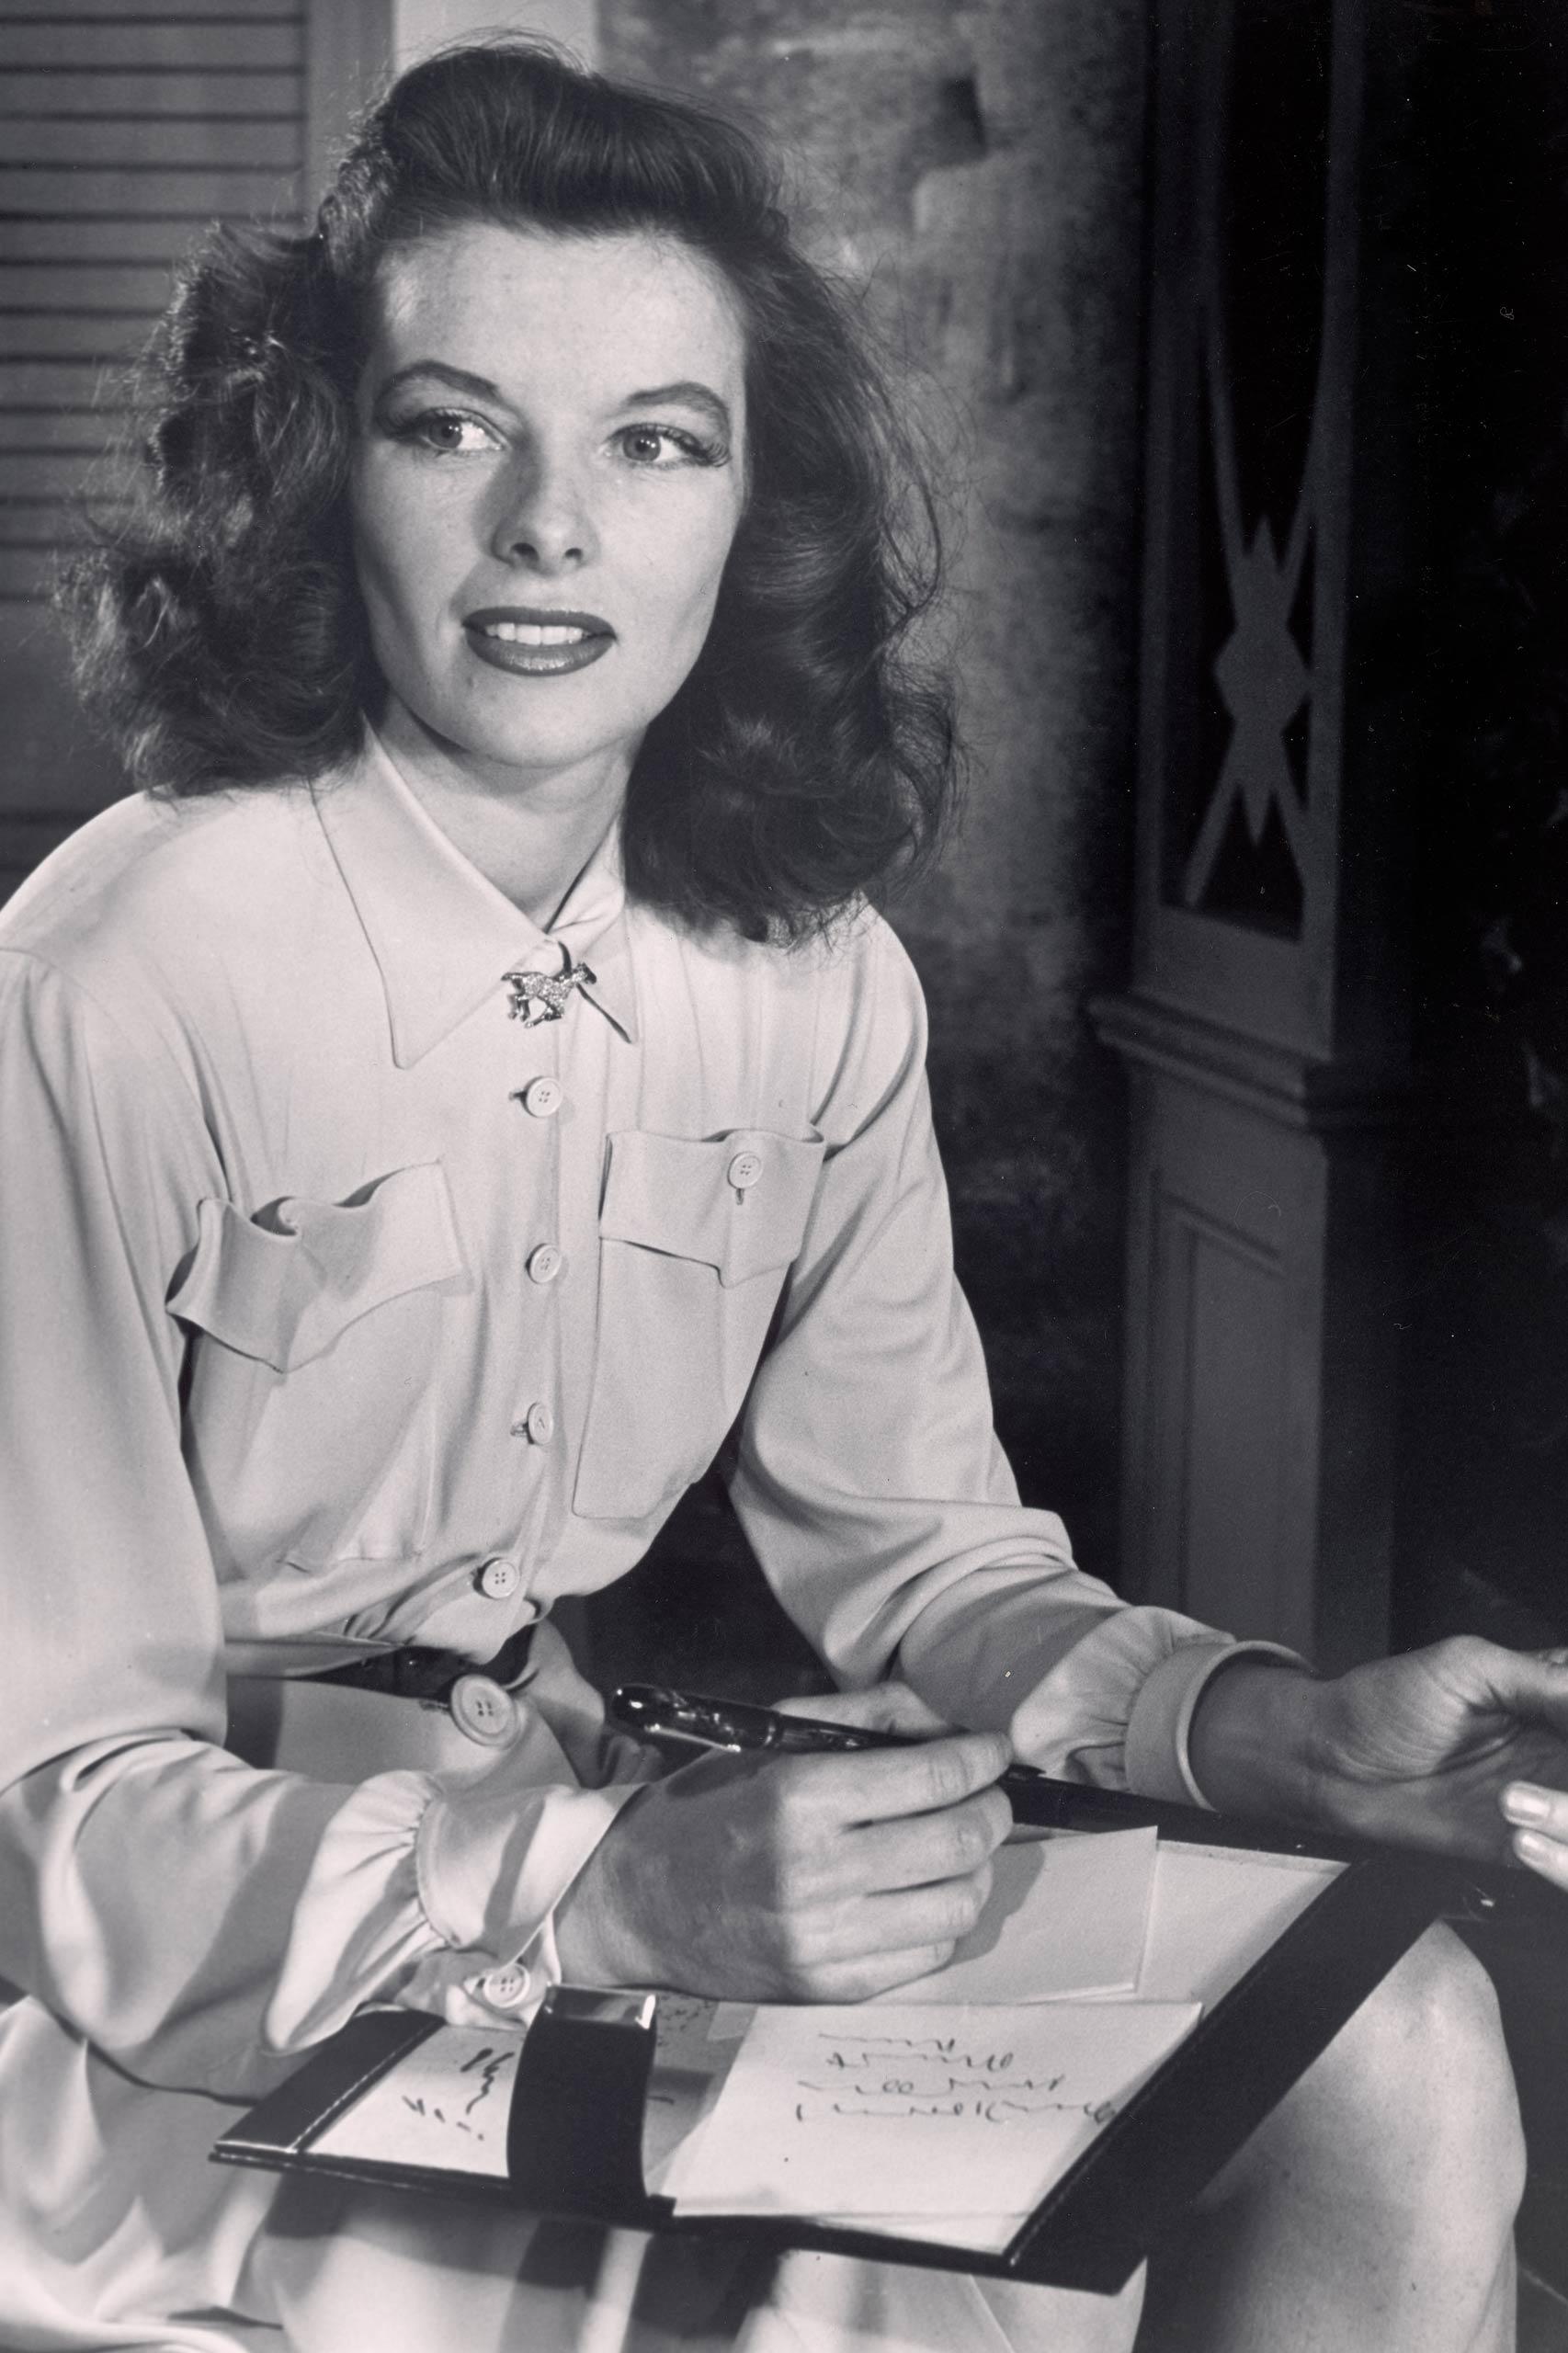 <strong>1934: Katharine Hepburn - <i>Morning Glory</i>                                   1968: Katharine Hepburn - <i>Guess Who's Coming to Dinner</i>                                   1969: Katharine Hepburn - <i>The Lion in Winter</i>                                   1982: Katharine Hepburn - <i>On Golden Pond</i></strong>